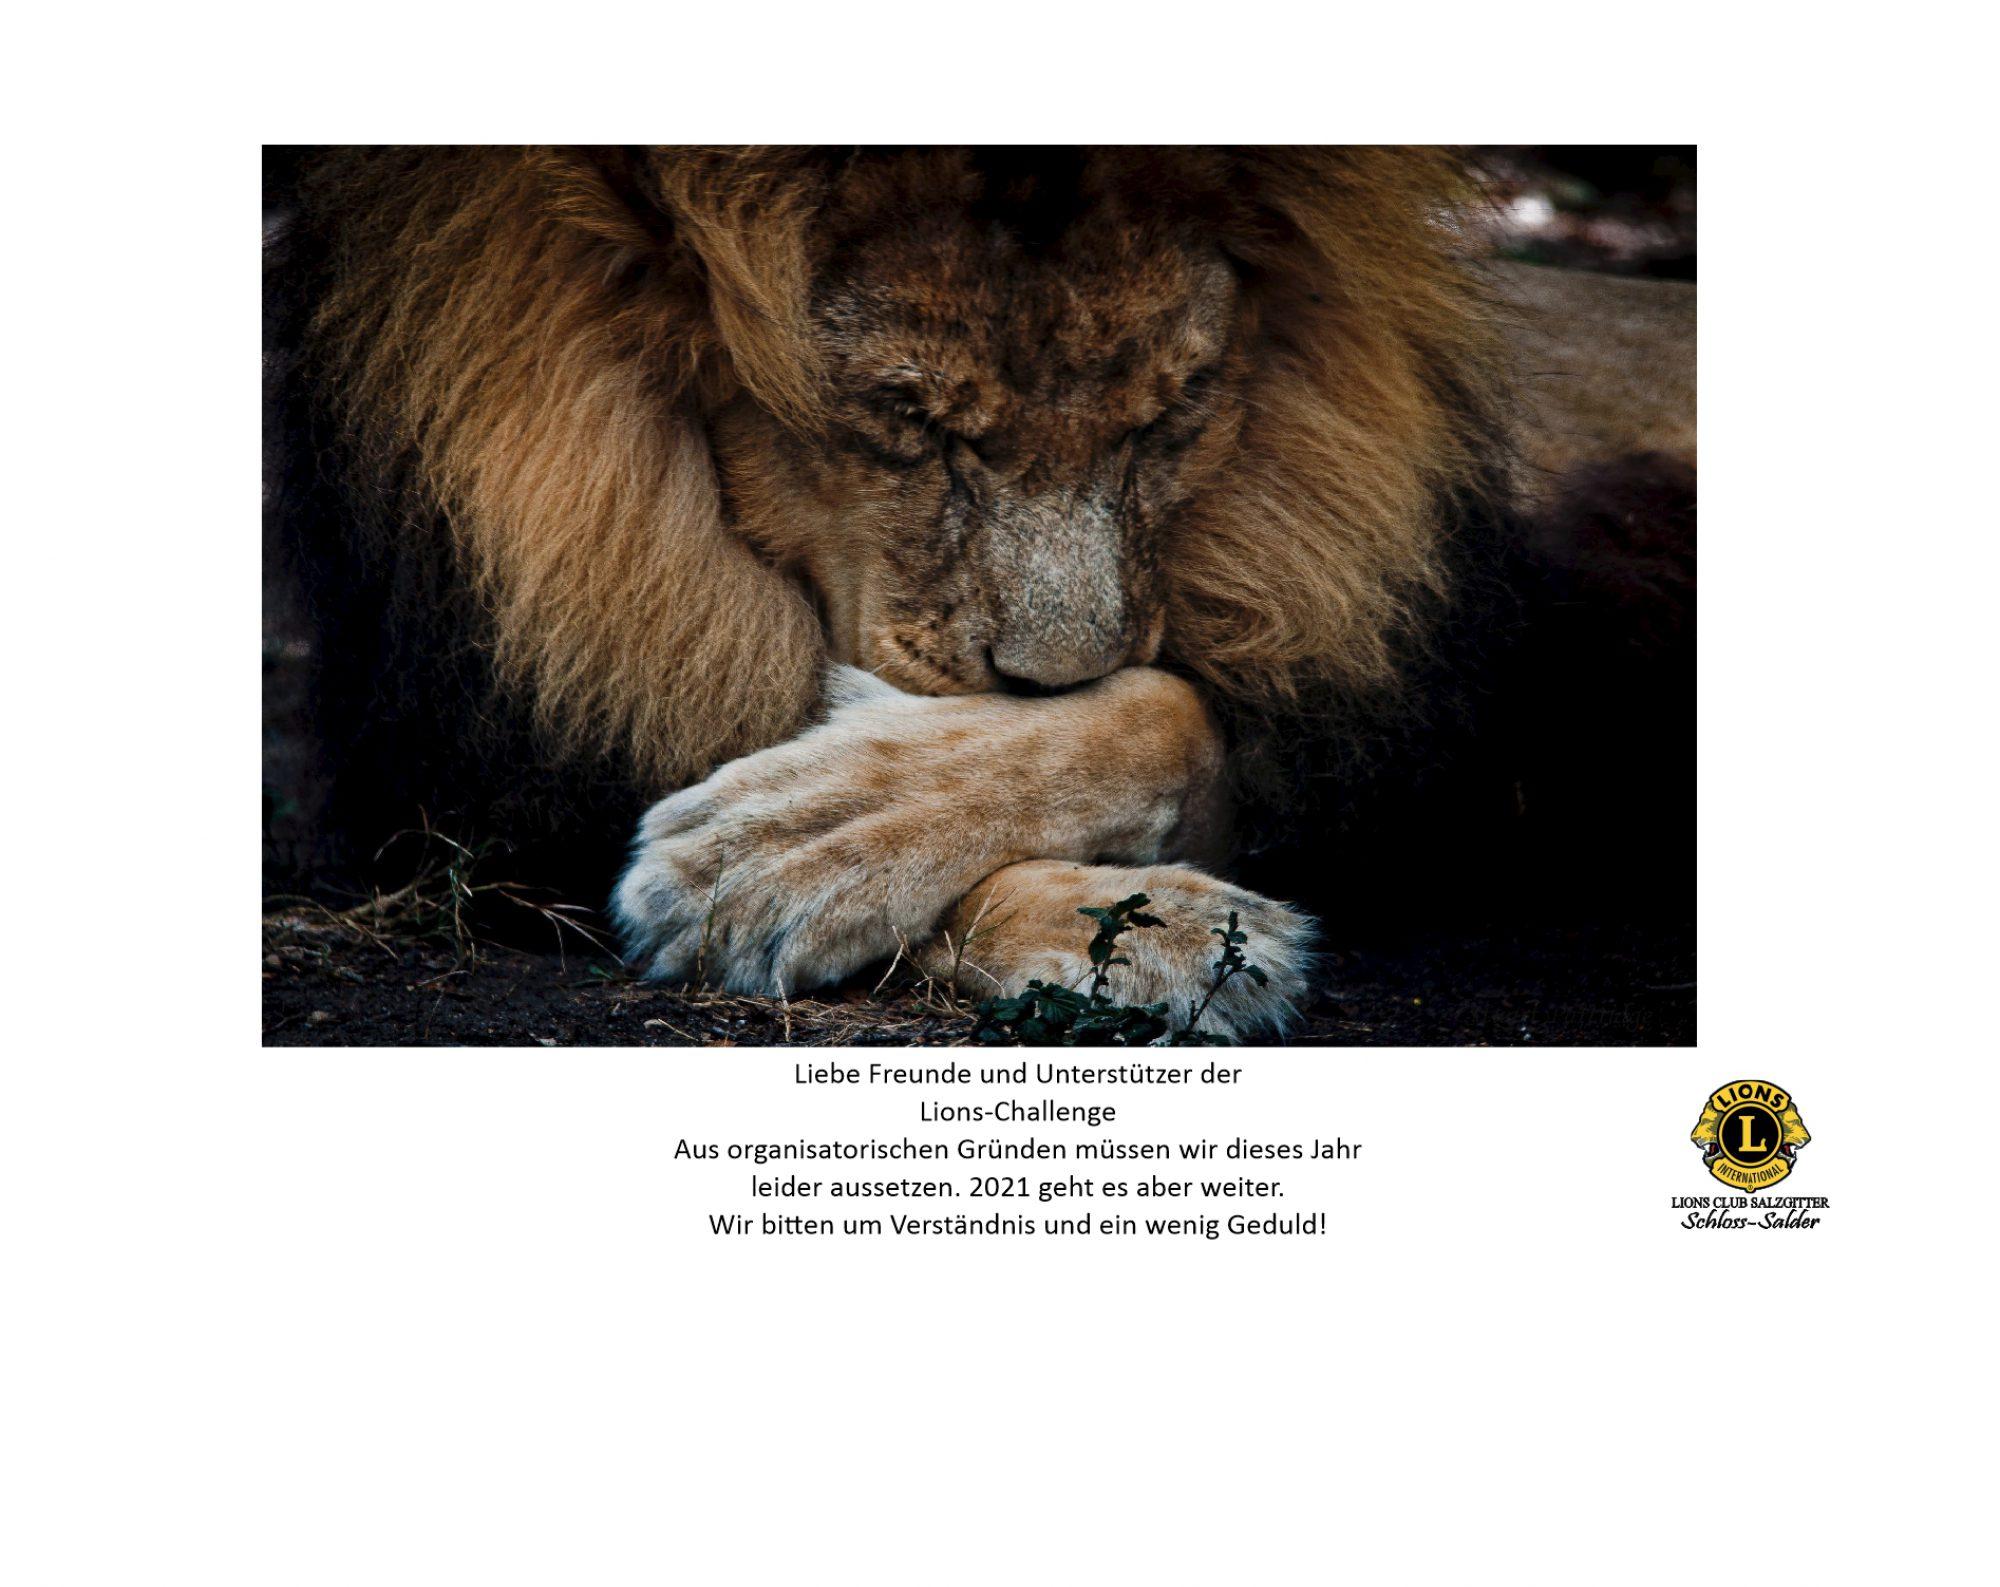 Lions-Challenge